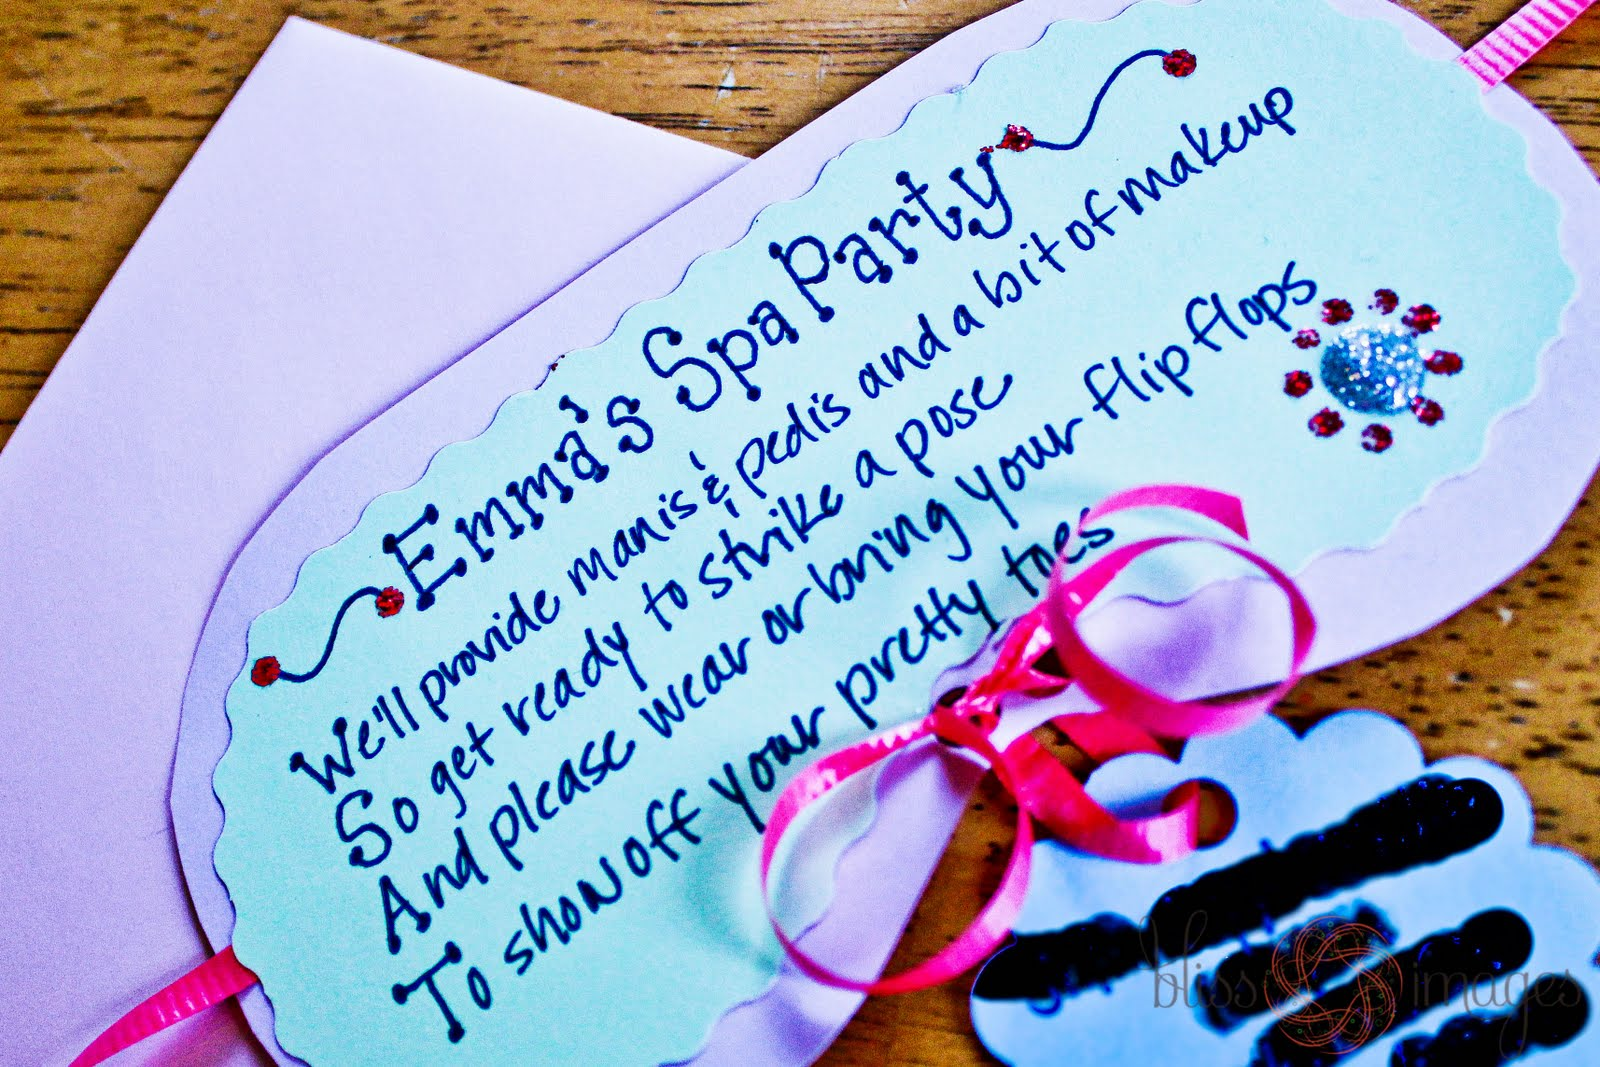 Homemade spa invitation party invitations ideas for Spa mask invitation template